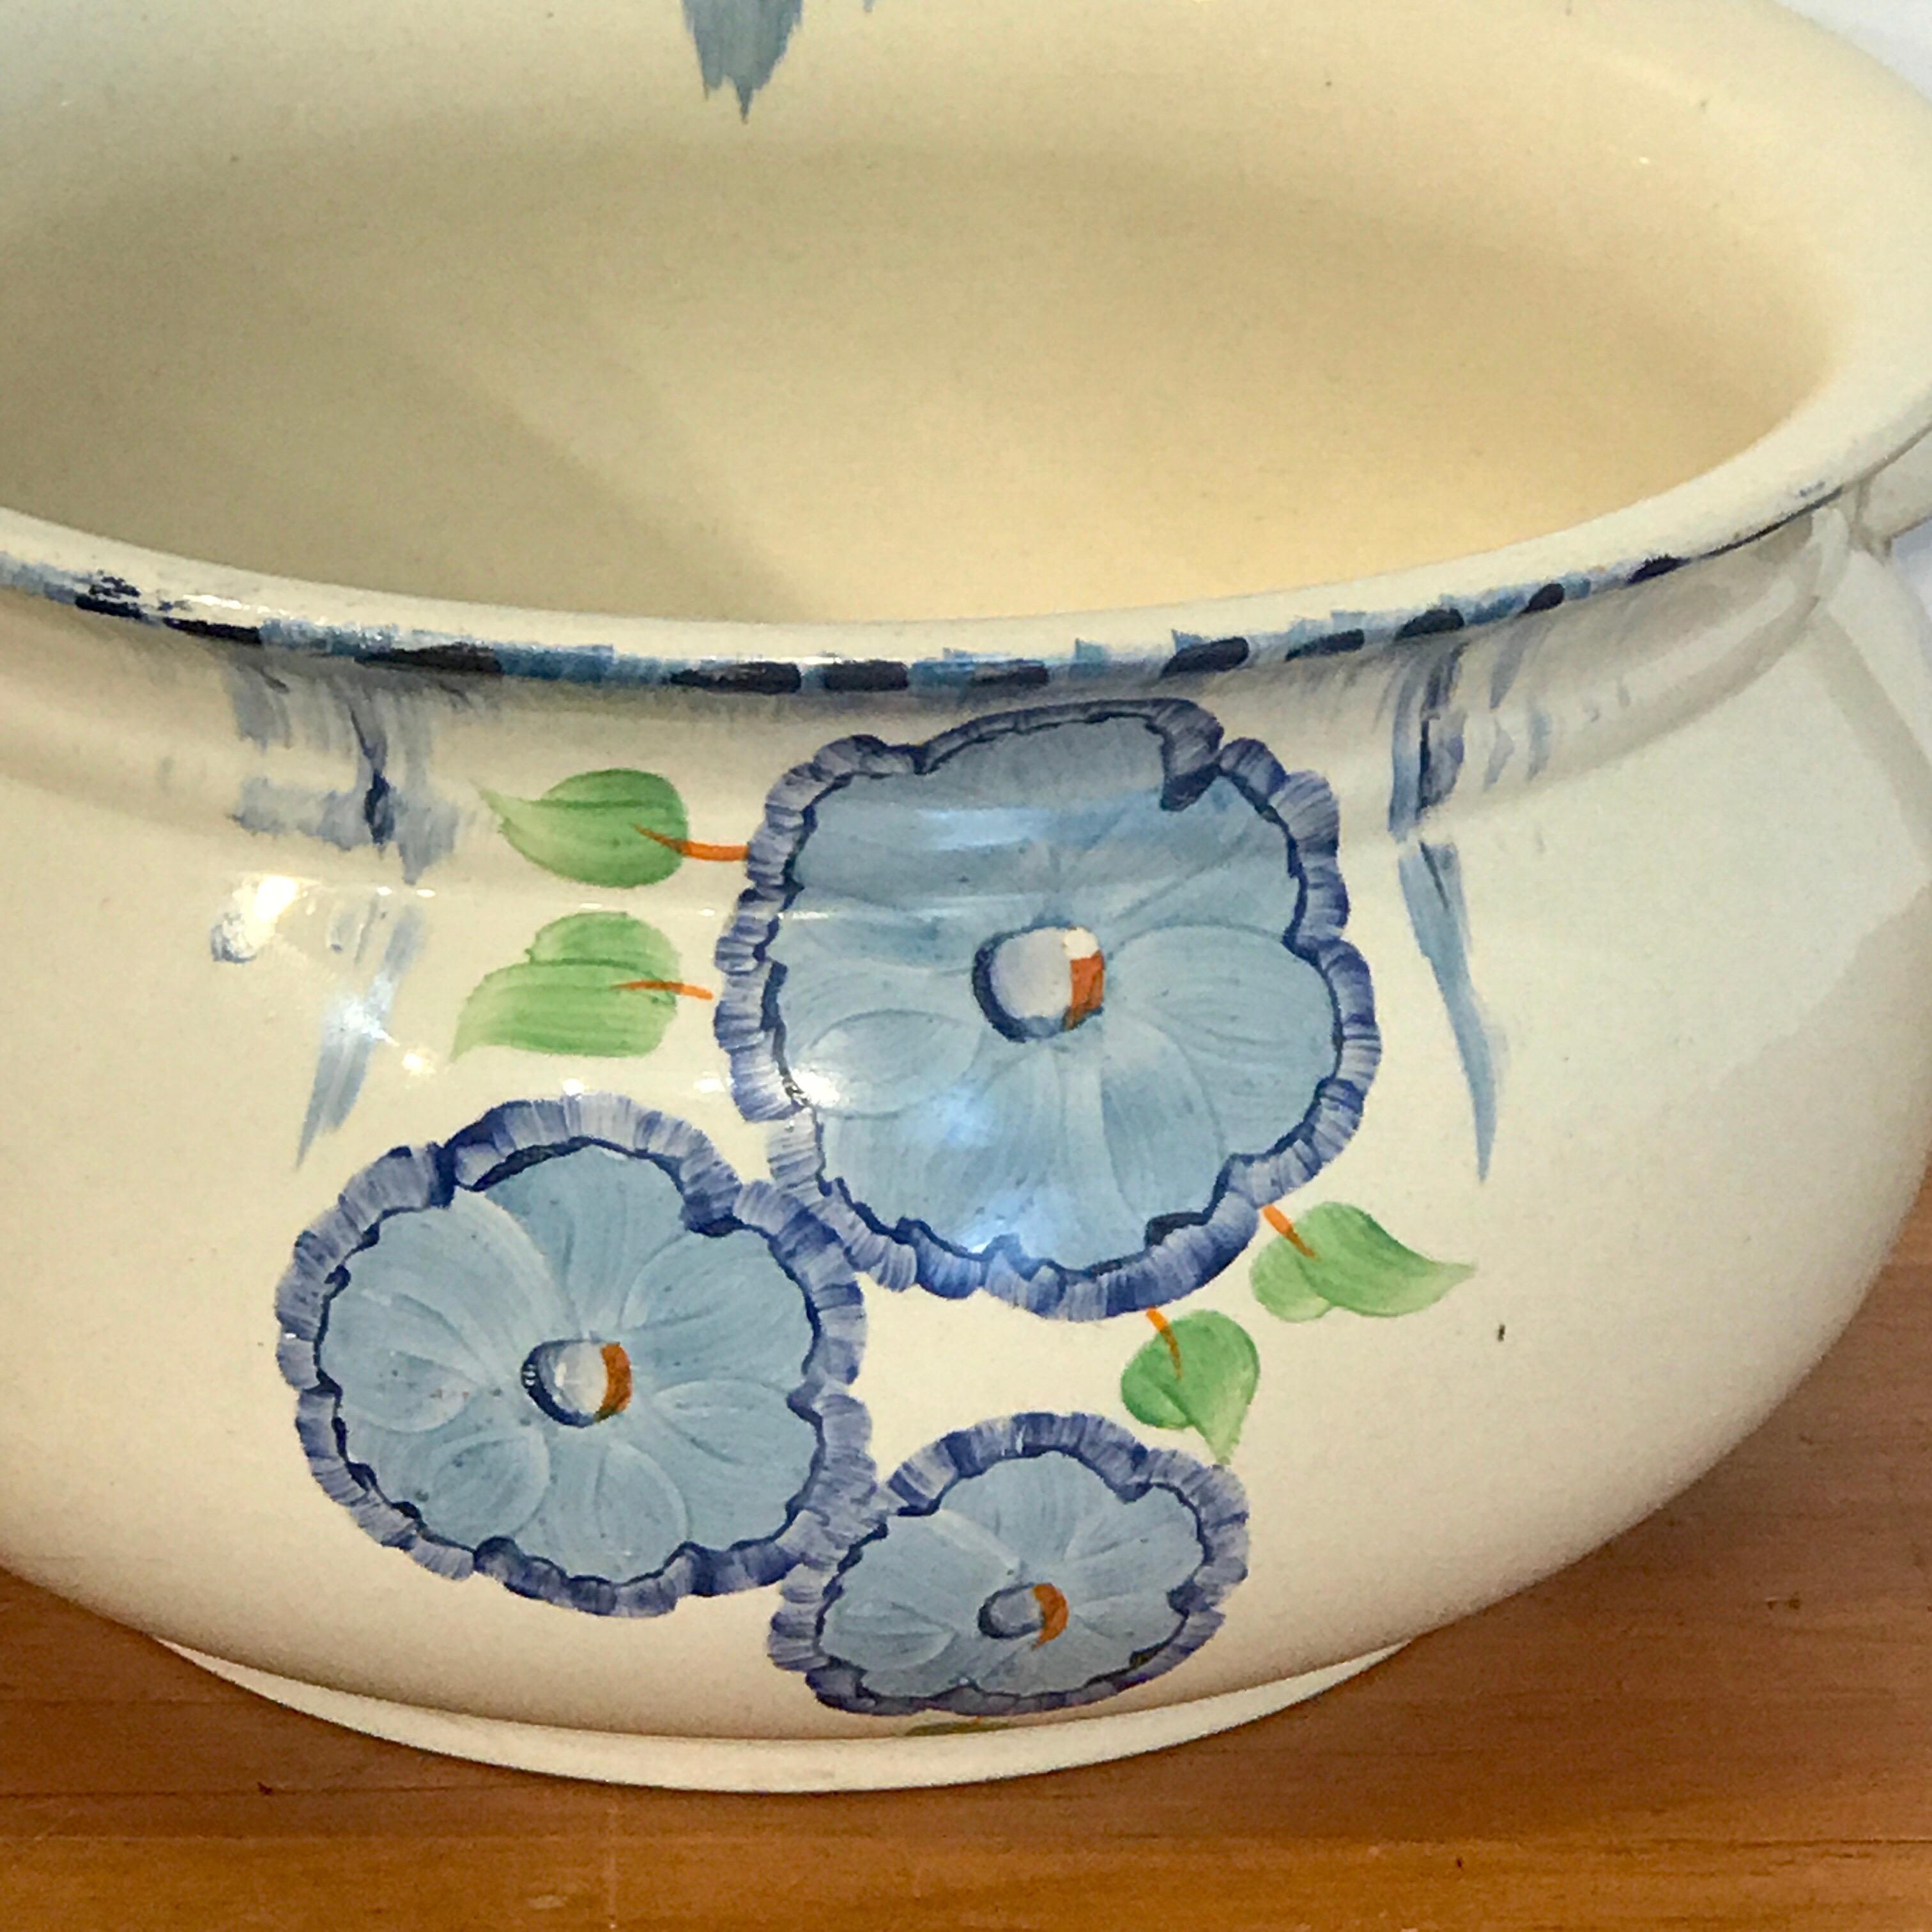 Deco Chambre Maryline Monroe marilyn monroe's pot de chambre, chrisites, 1999 at 1stdibs